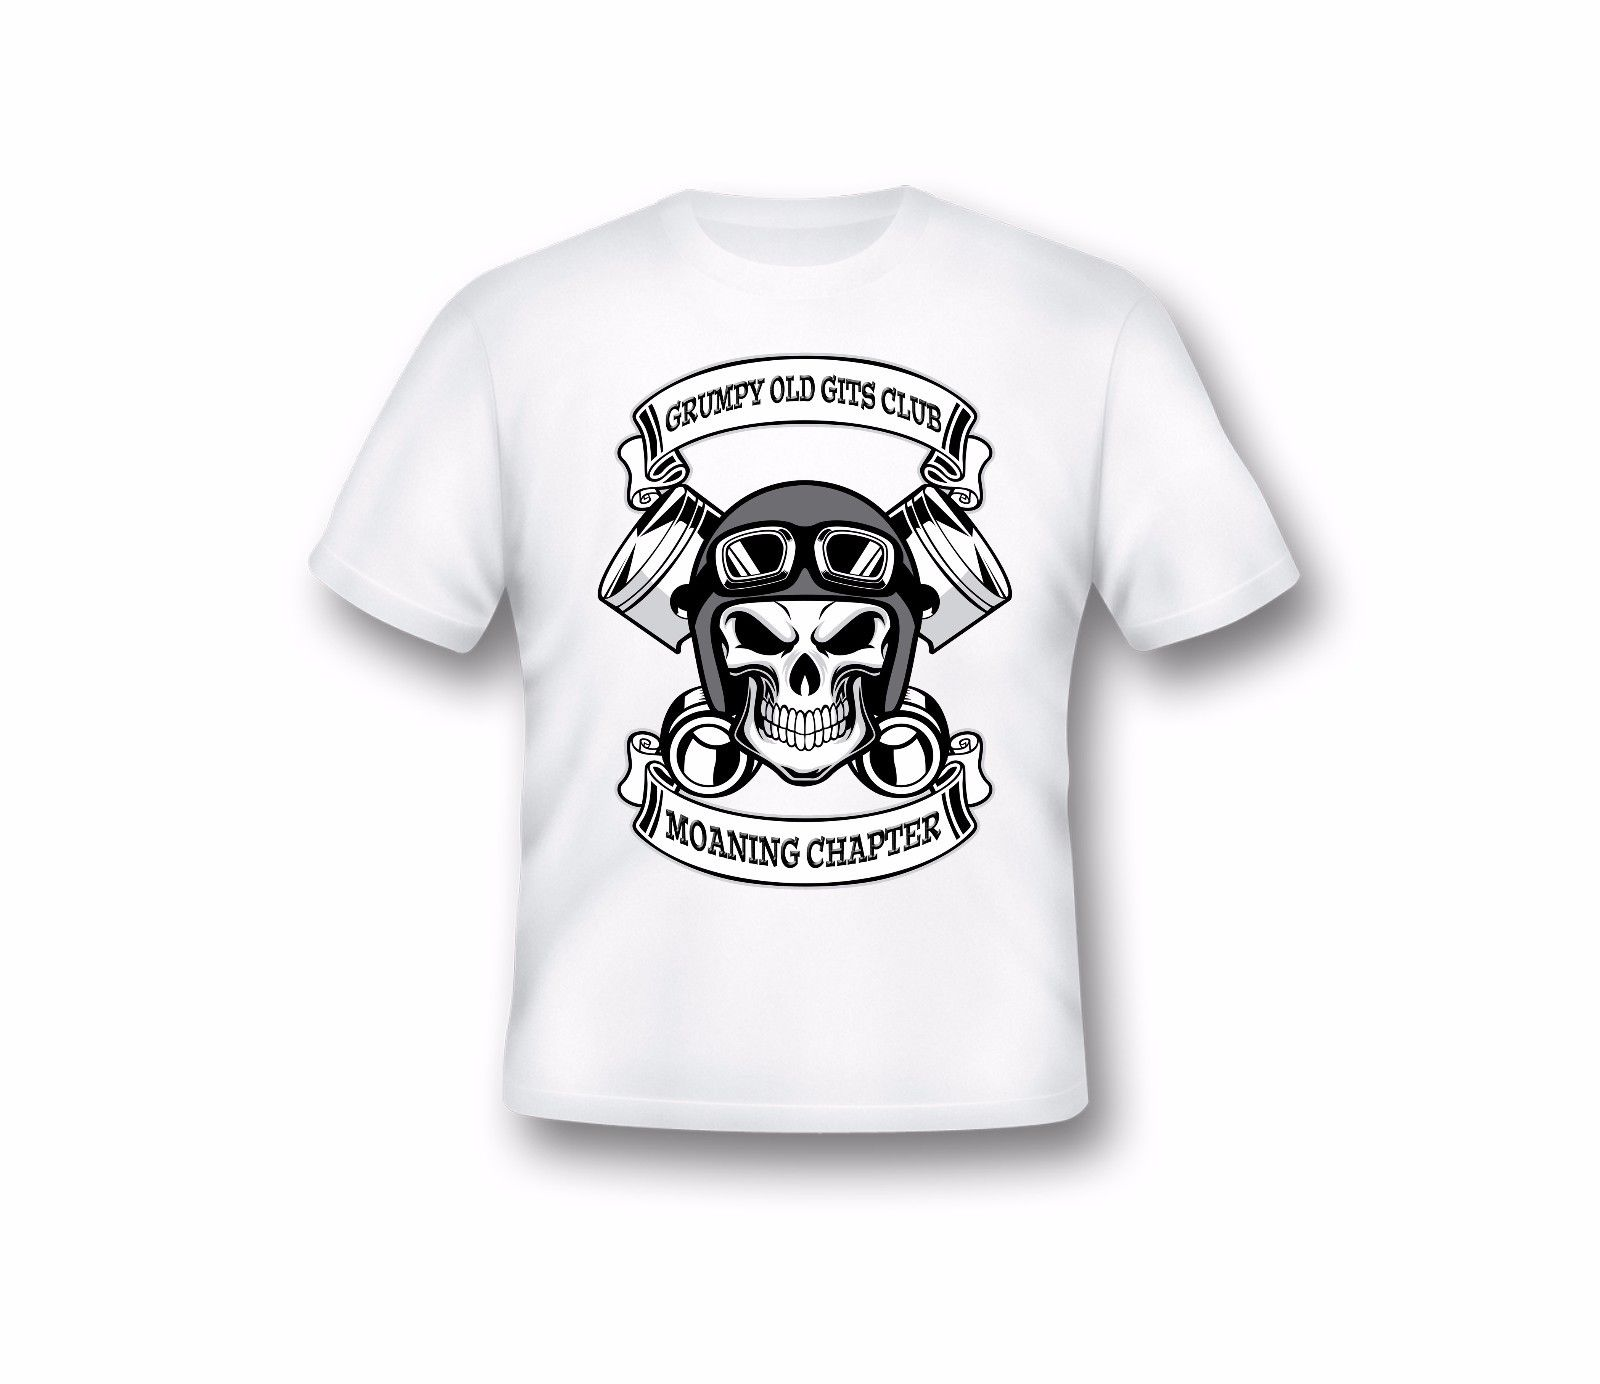 Gildan VECCHIO SCONTROSO GITS Moaning Chapter T Shirt, Uomo, Divertenti T-Shirt,